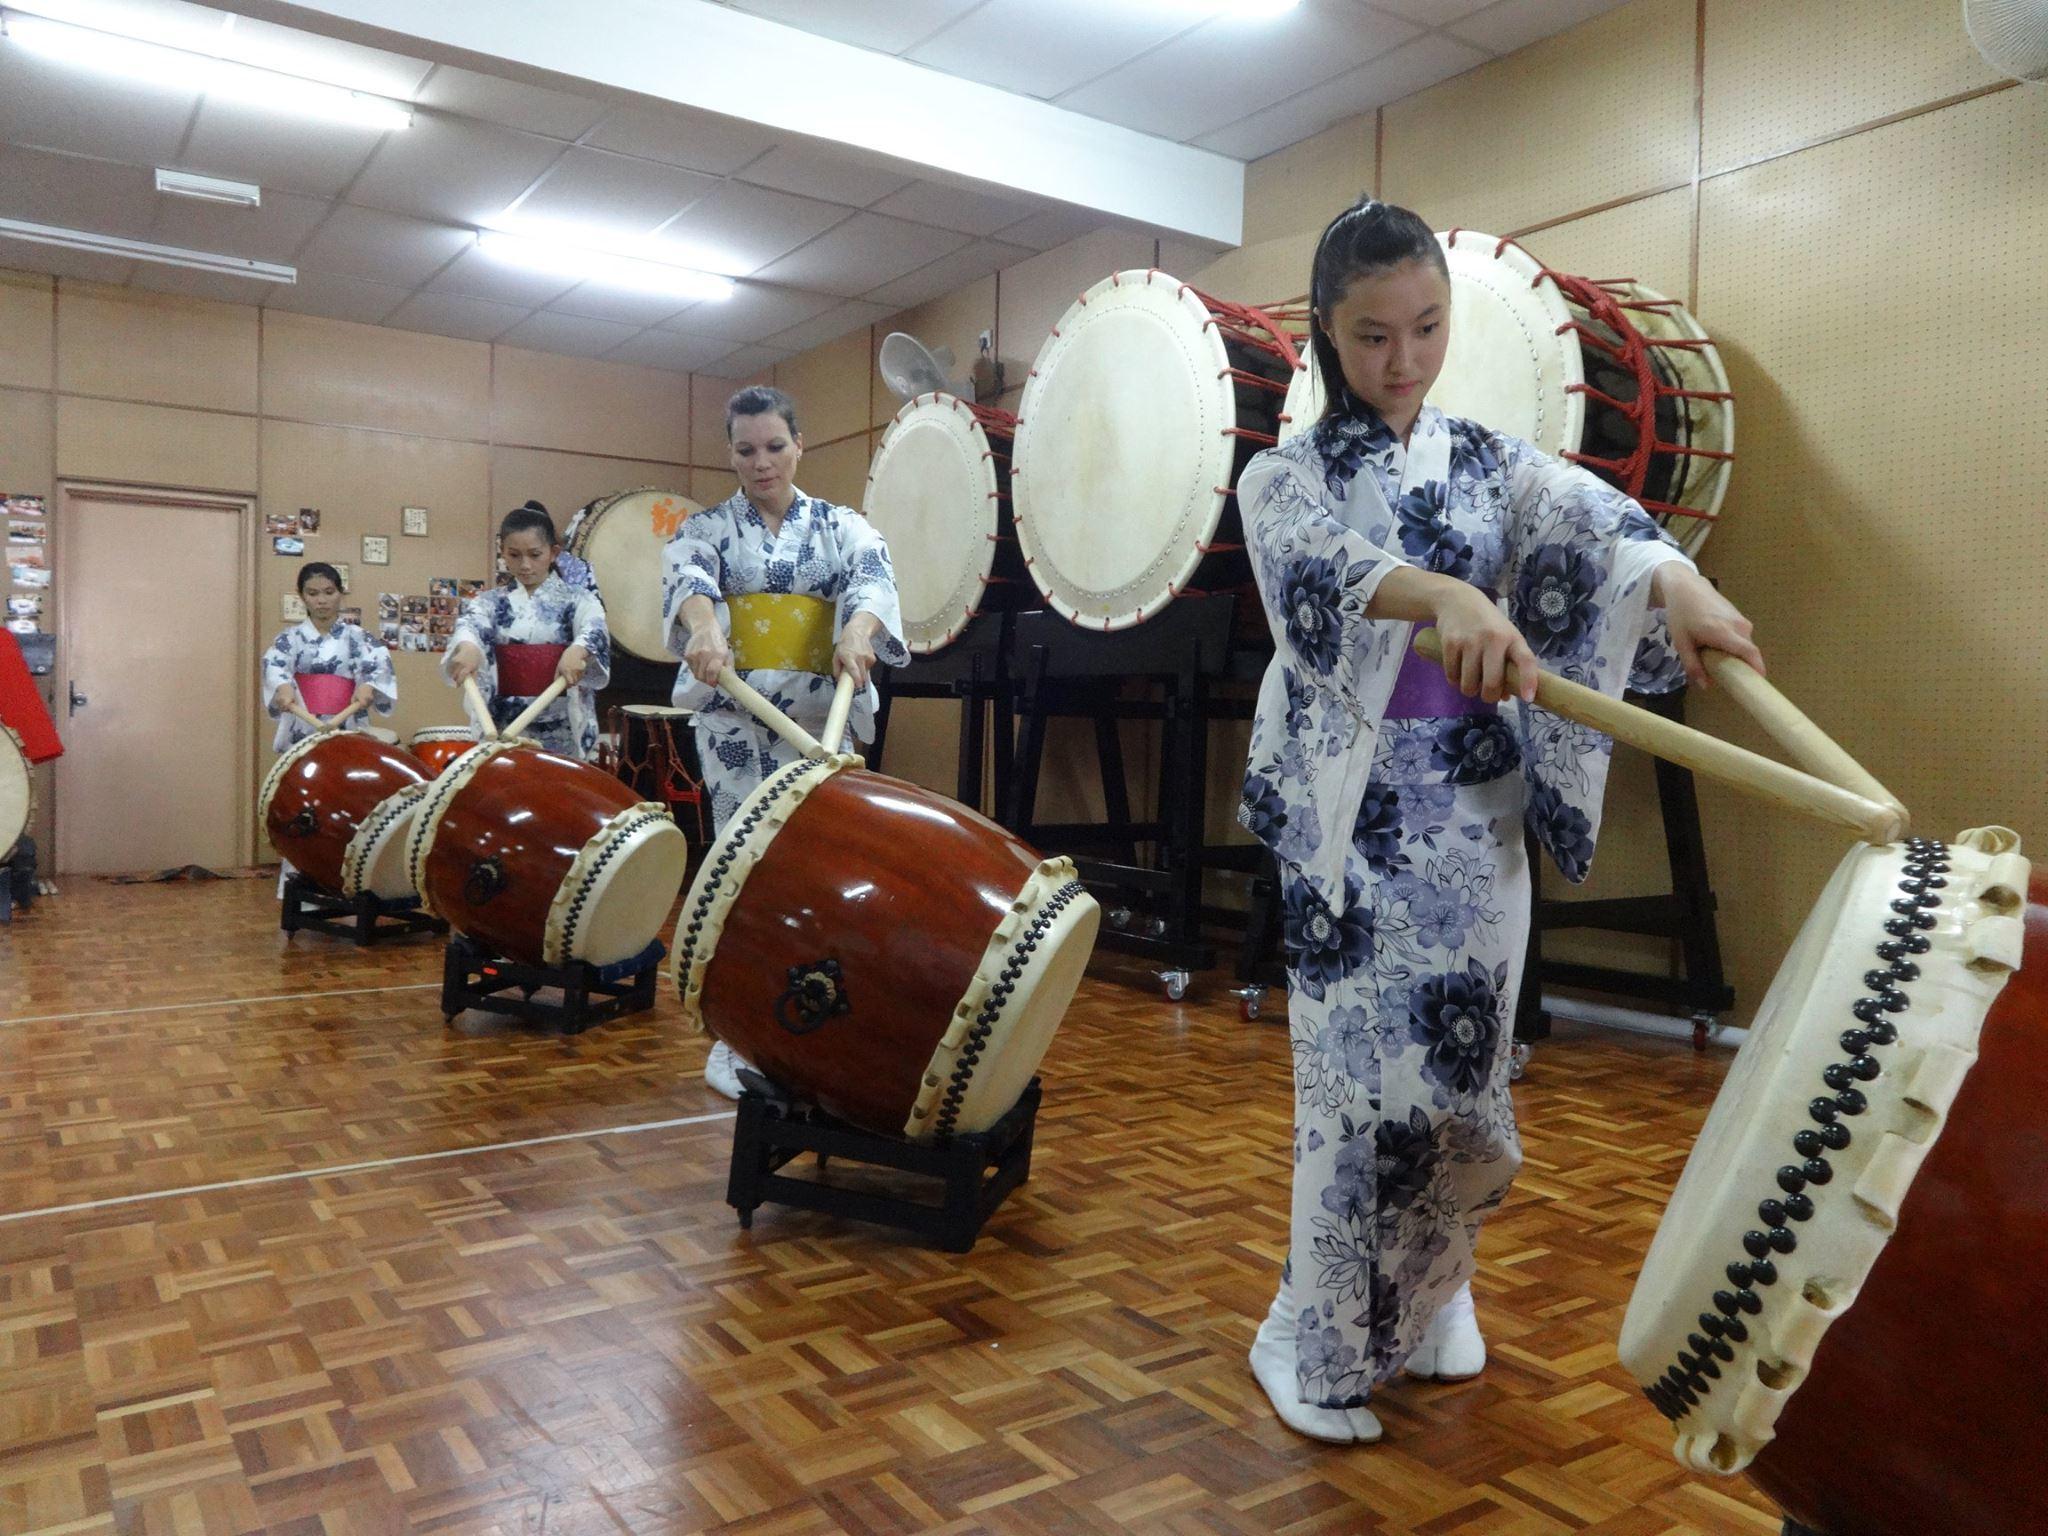 Wadaiko Syo: The art of taiko drumming